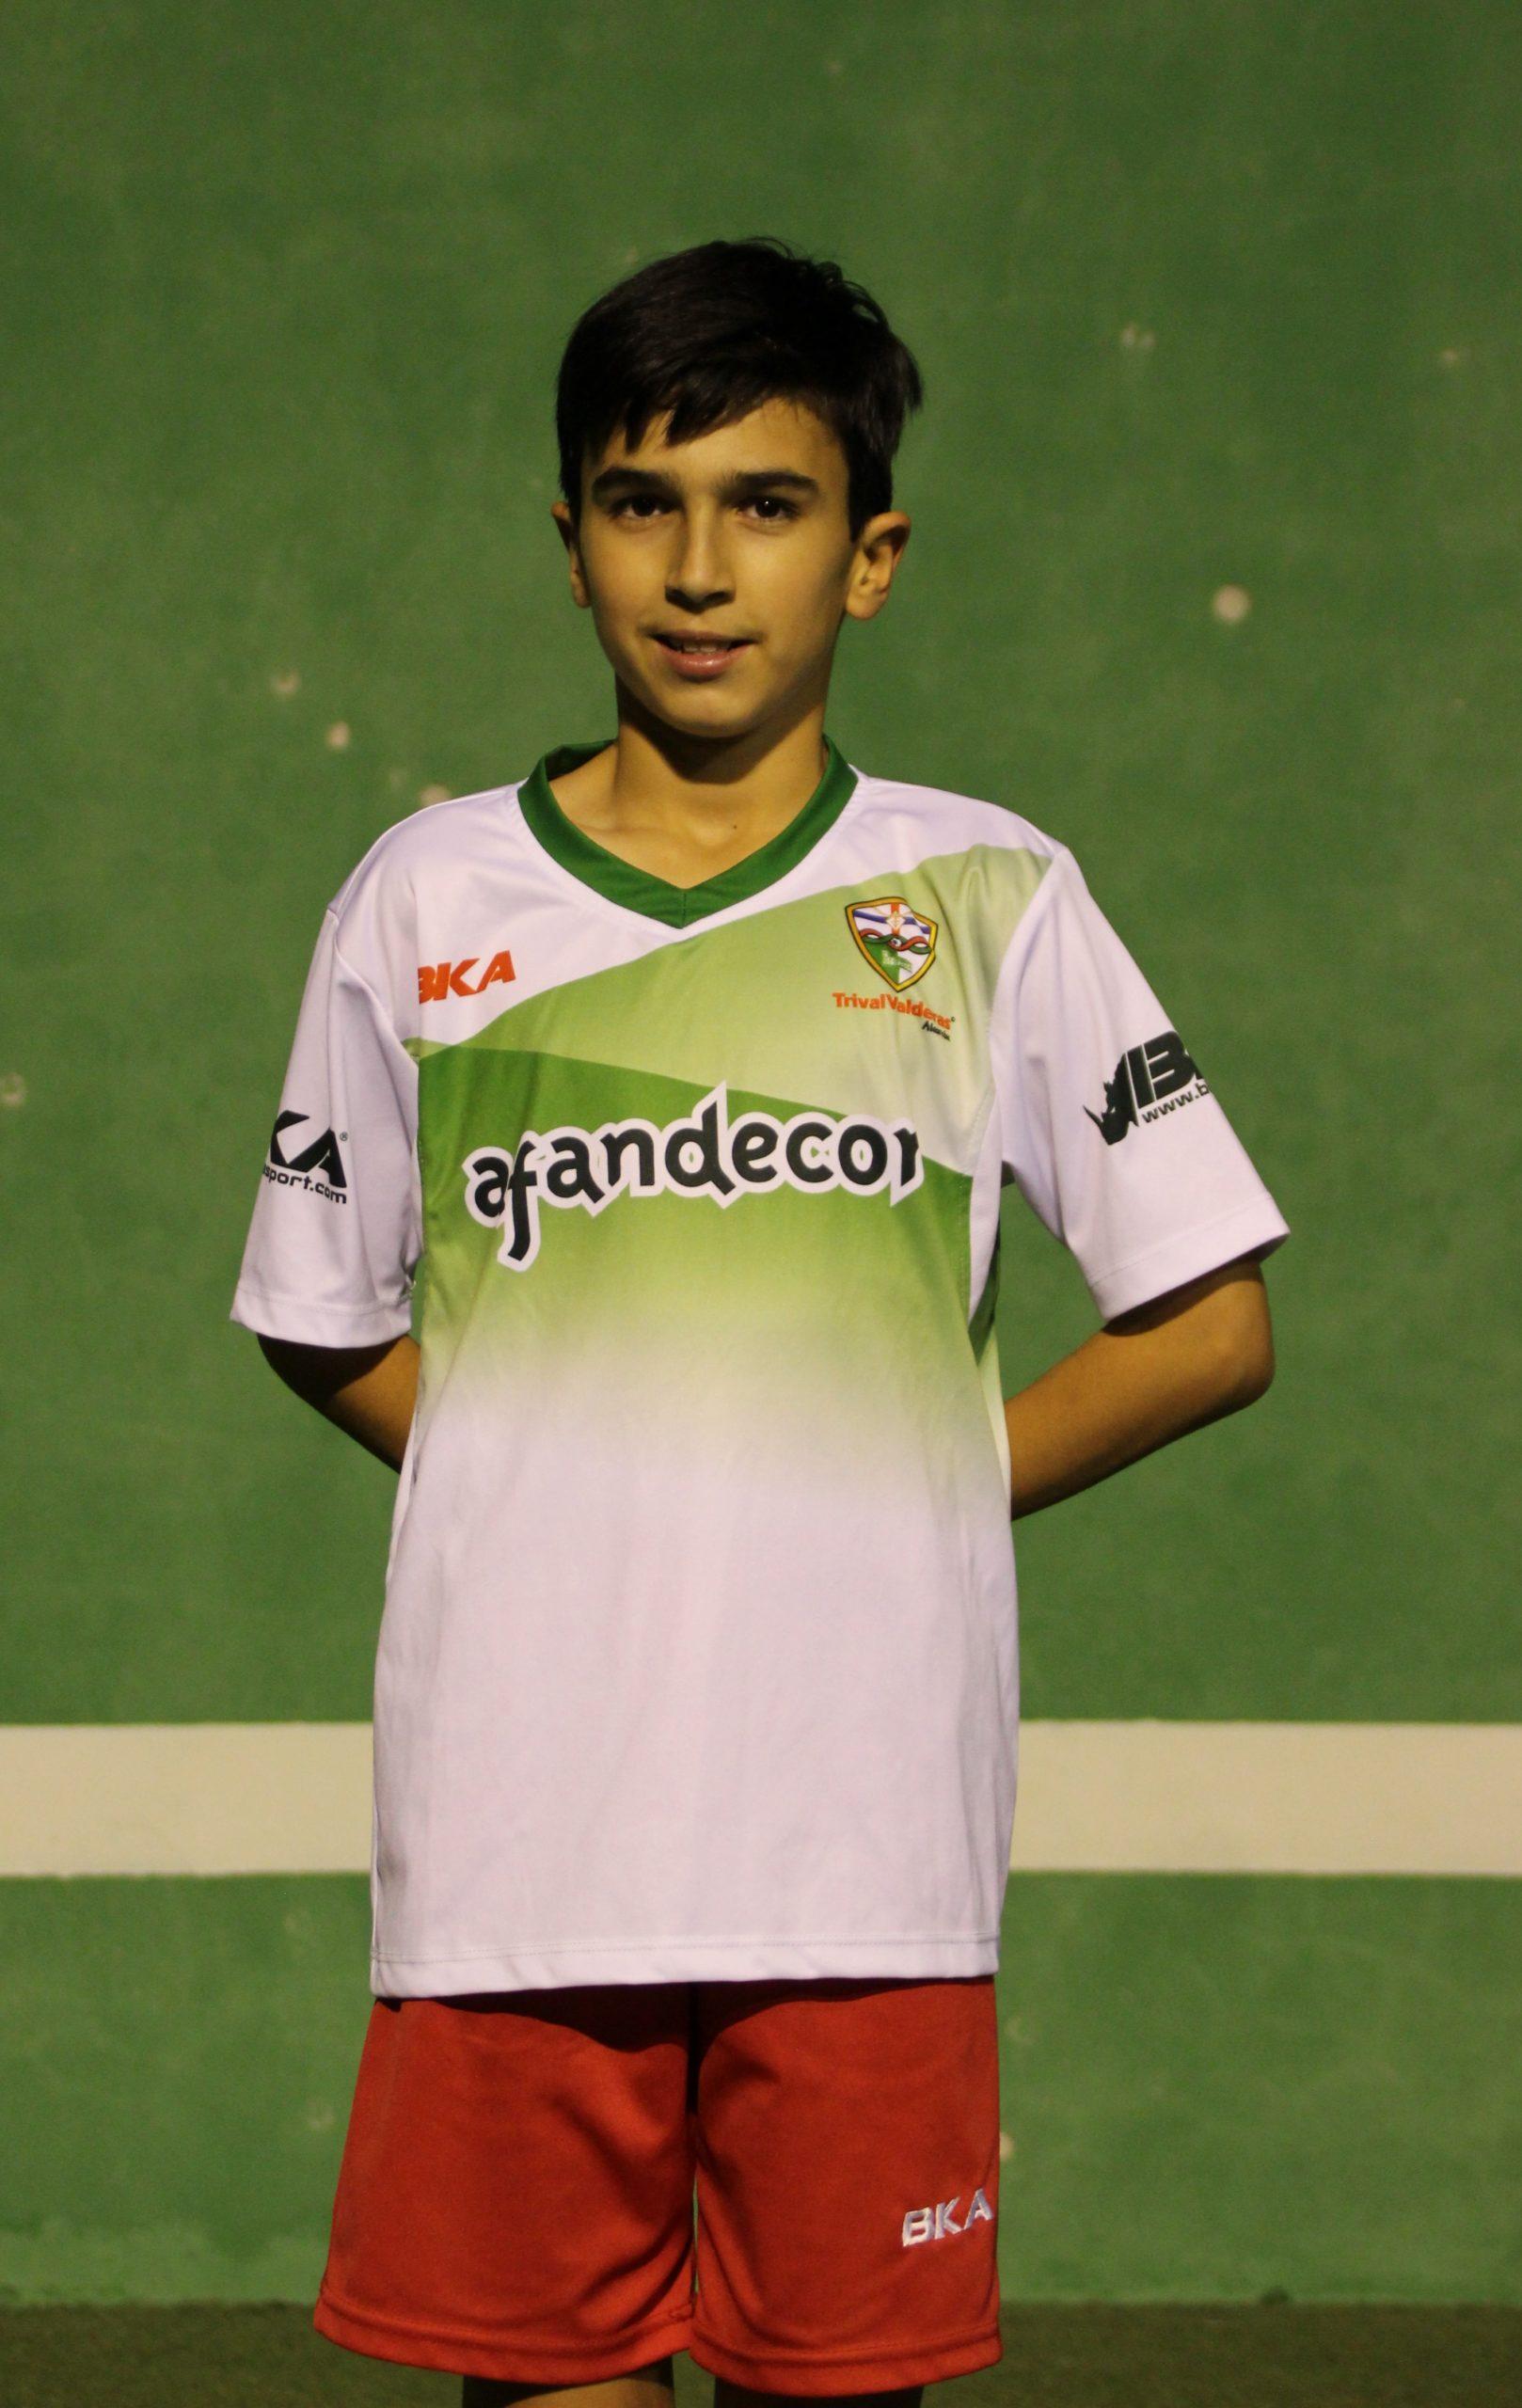 1 Hugo Moreno Marín